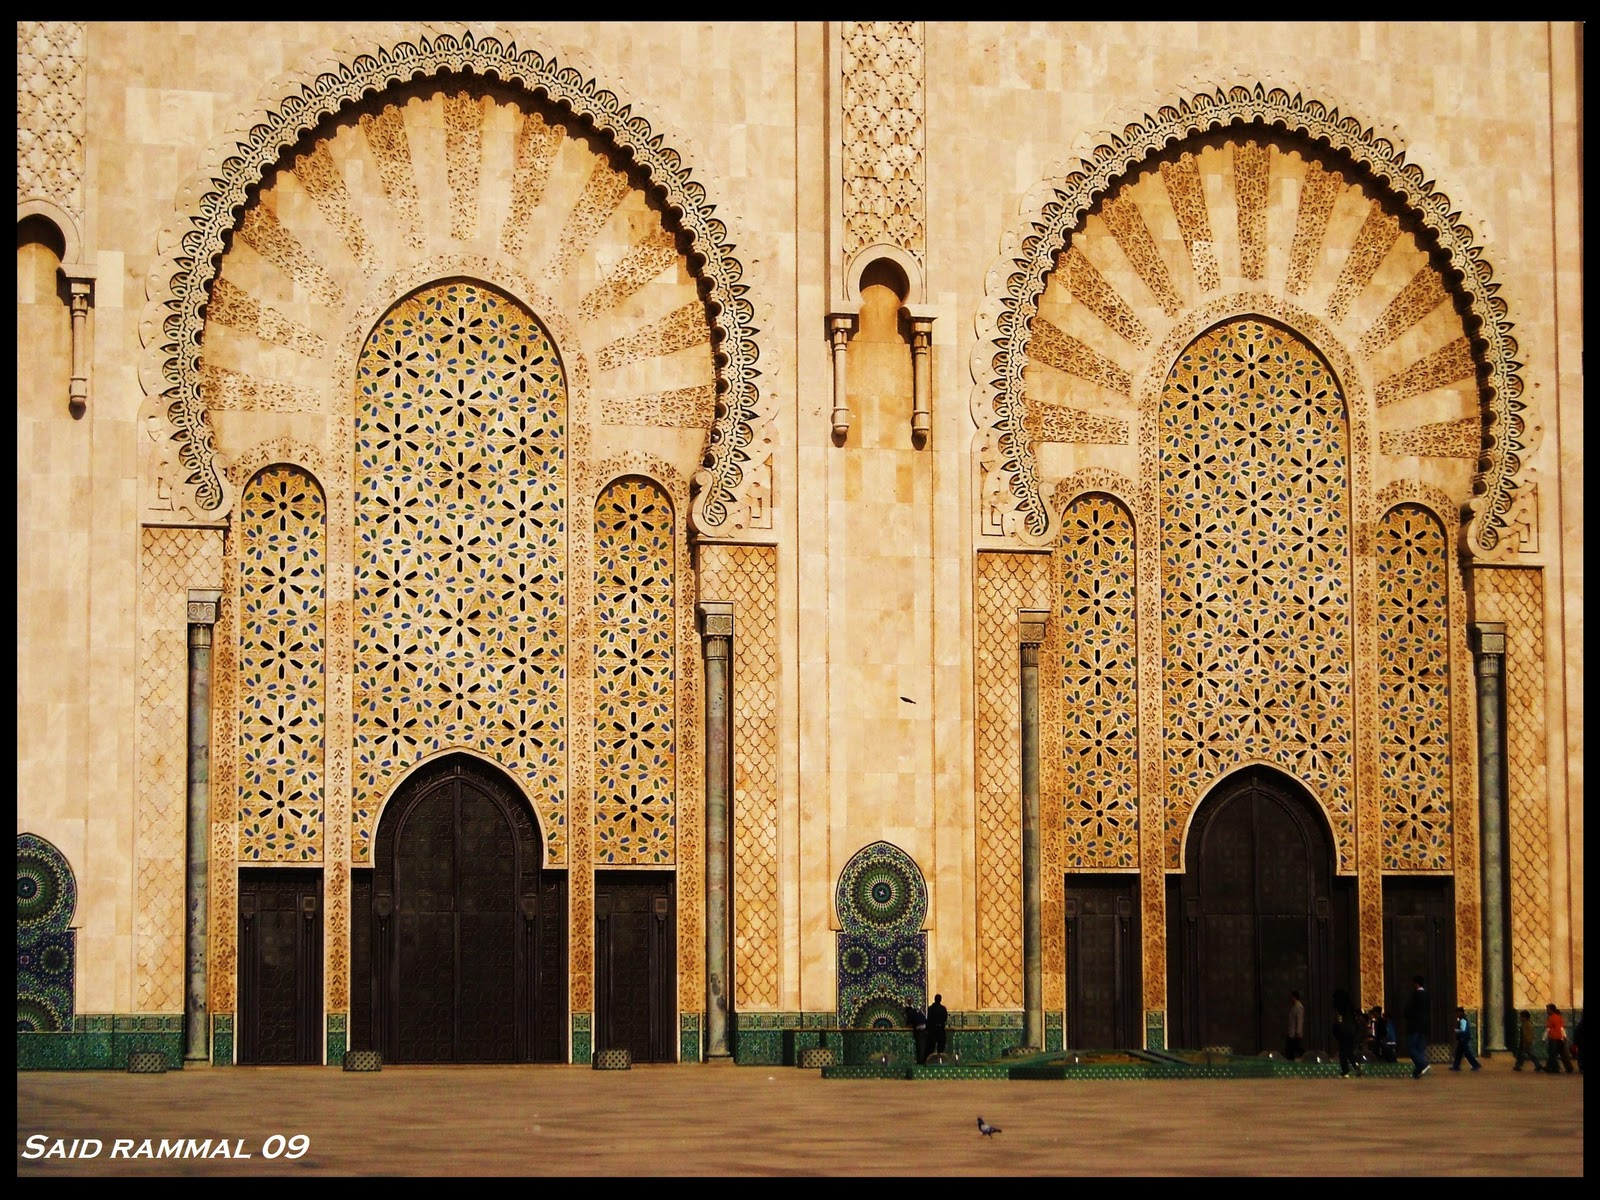 Morocco casablanca mosqu e hassan ii moroccan interior for Mosquee hassan 2 interieur